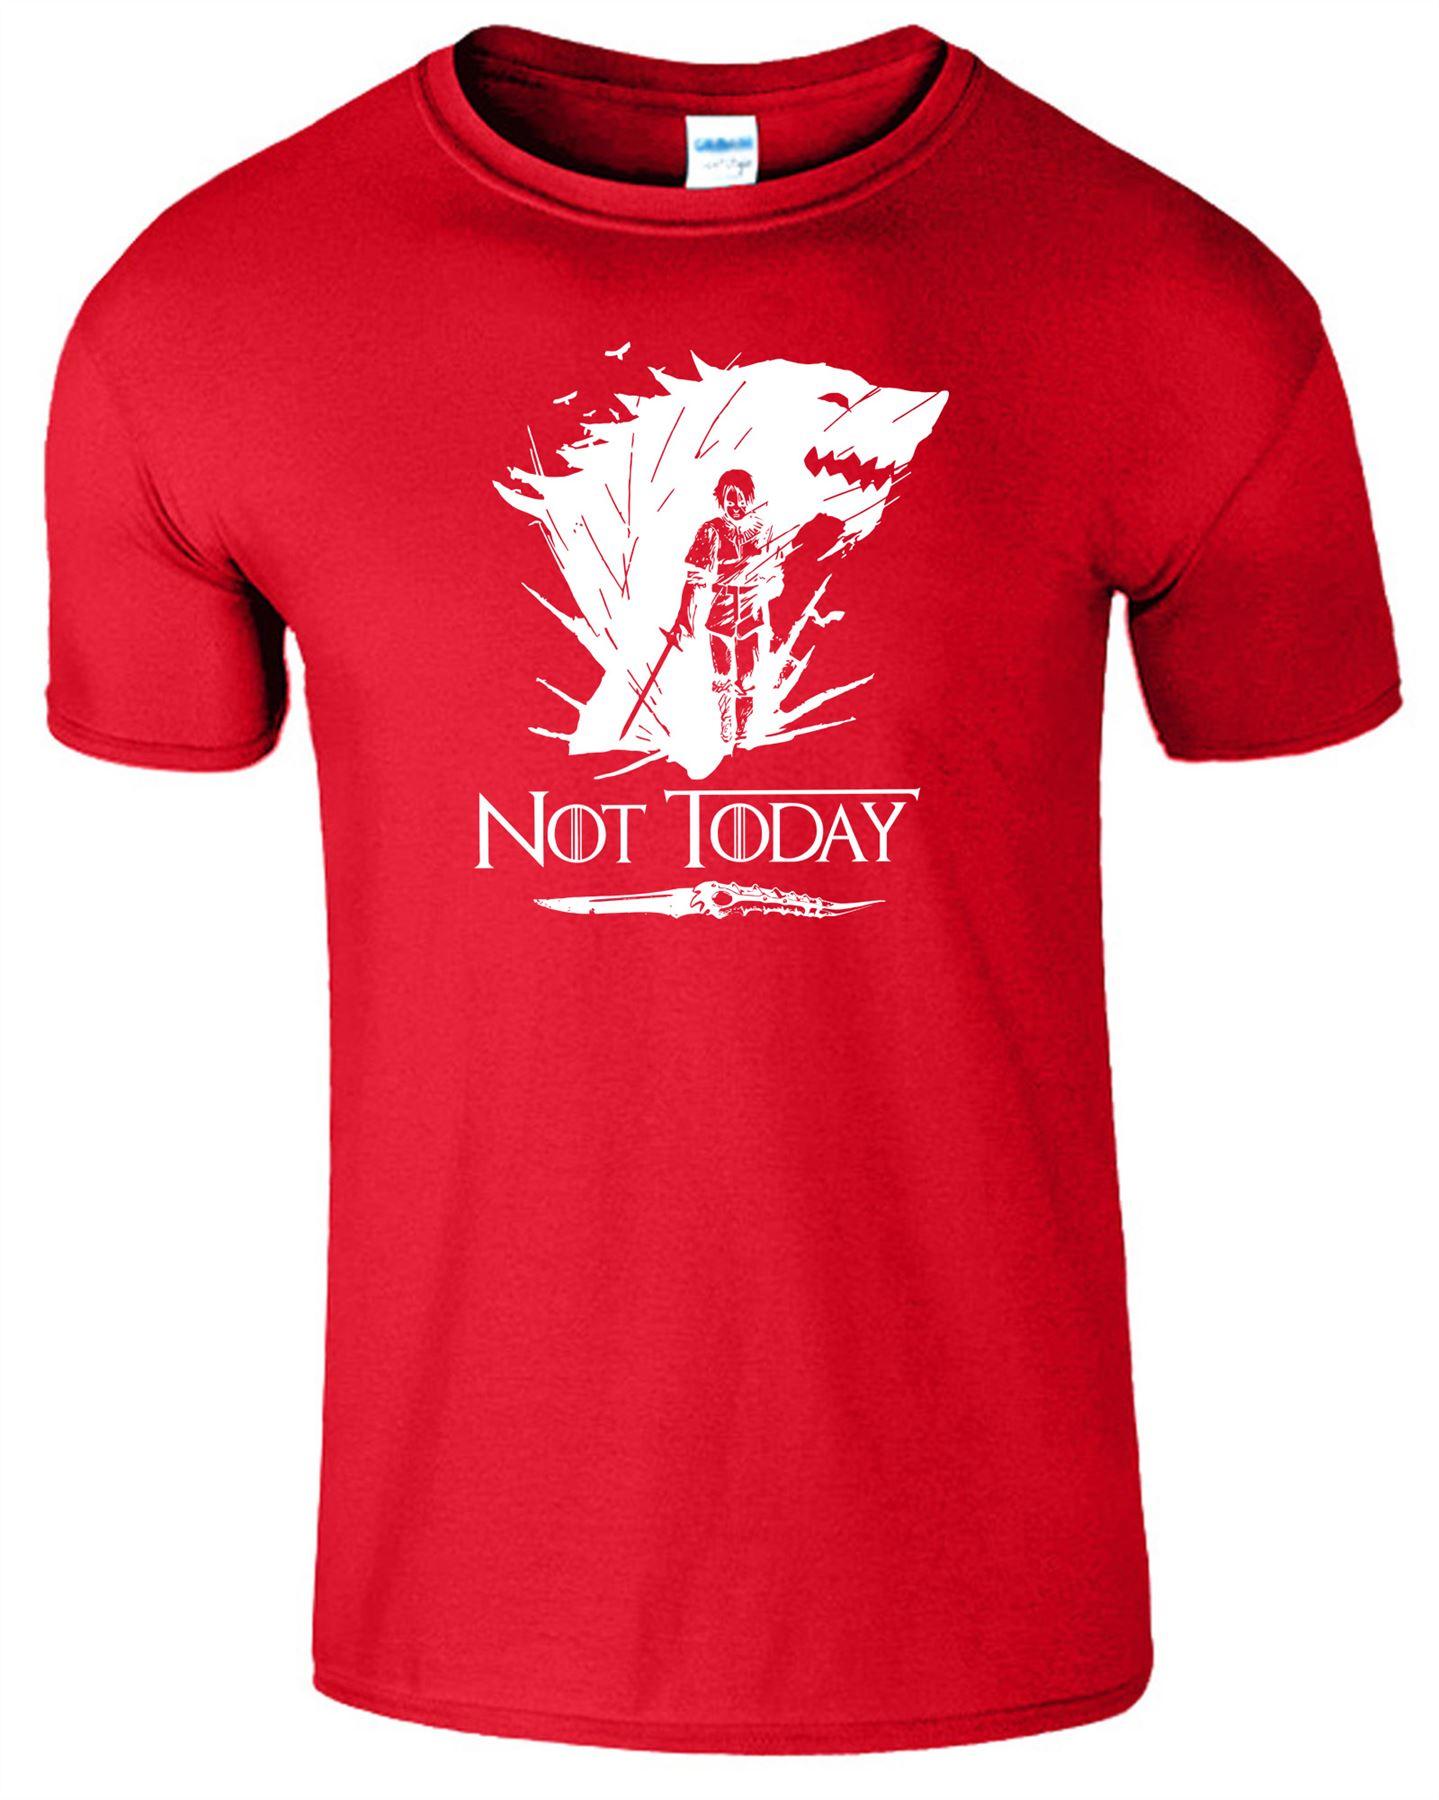 Arya-Stark-Not-Today-T-Shirt-Mens-Game-Season-Womens-Shirt-Adults-Unisex-Fit Indexbild 39